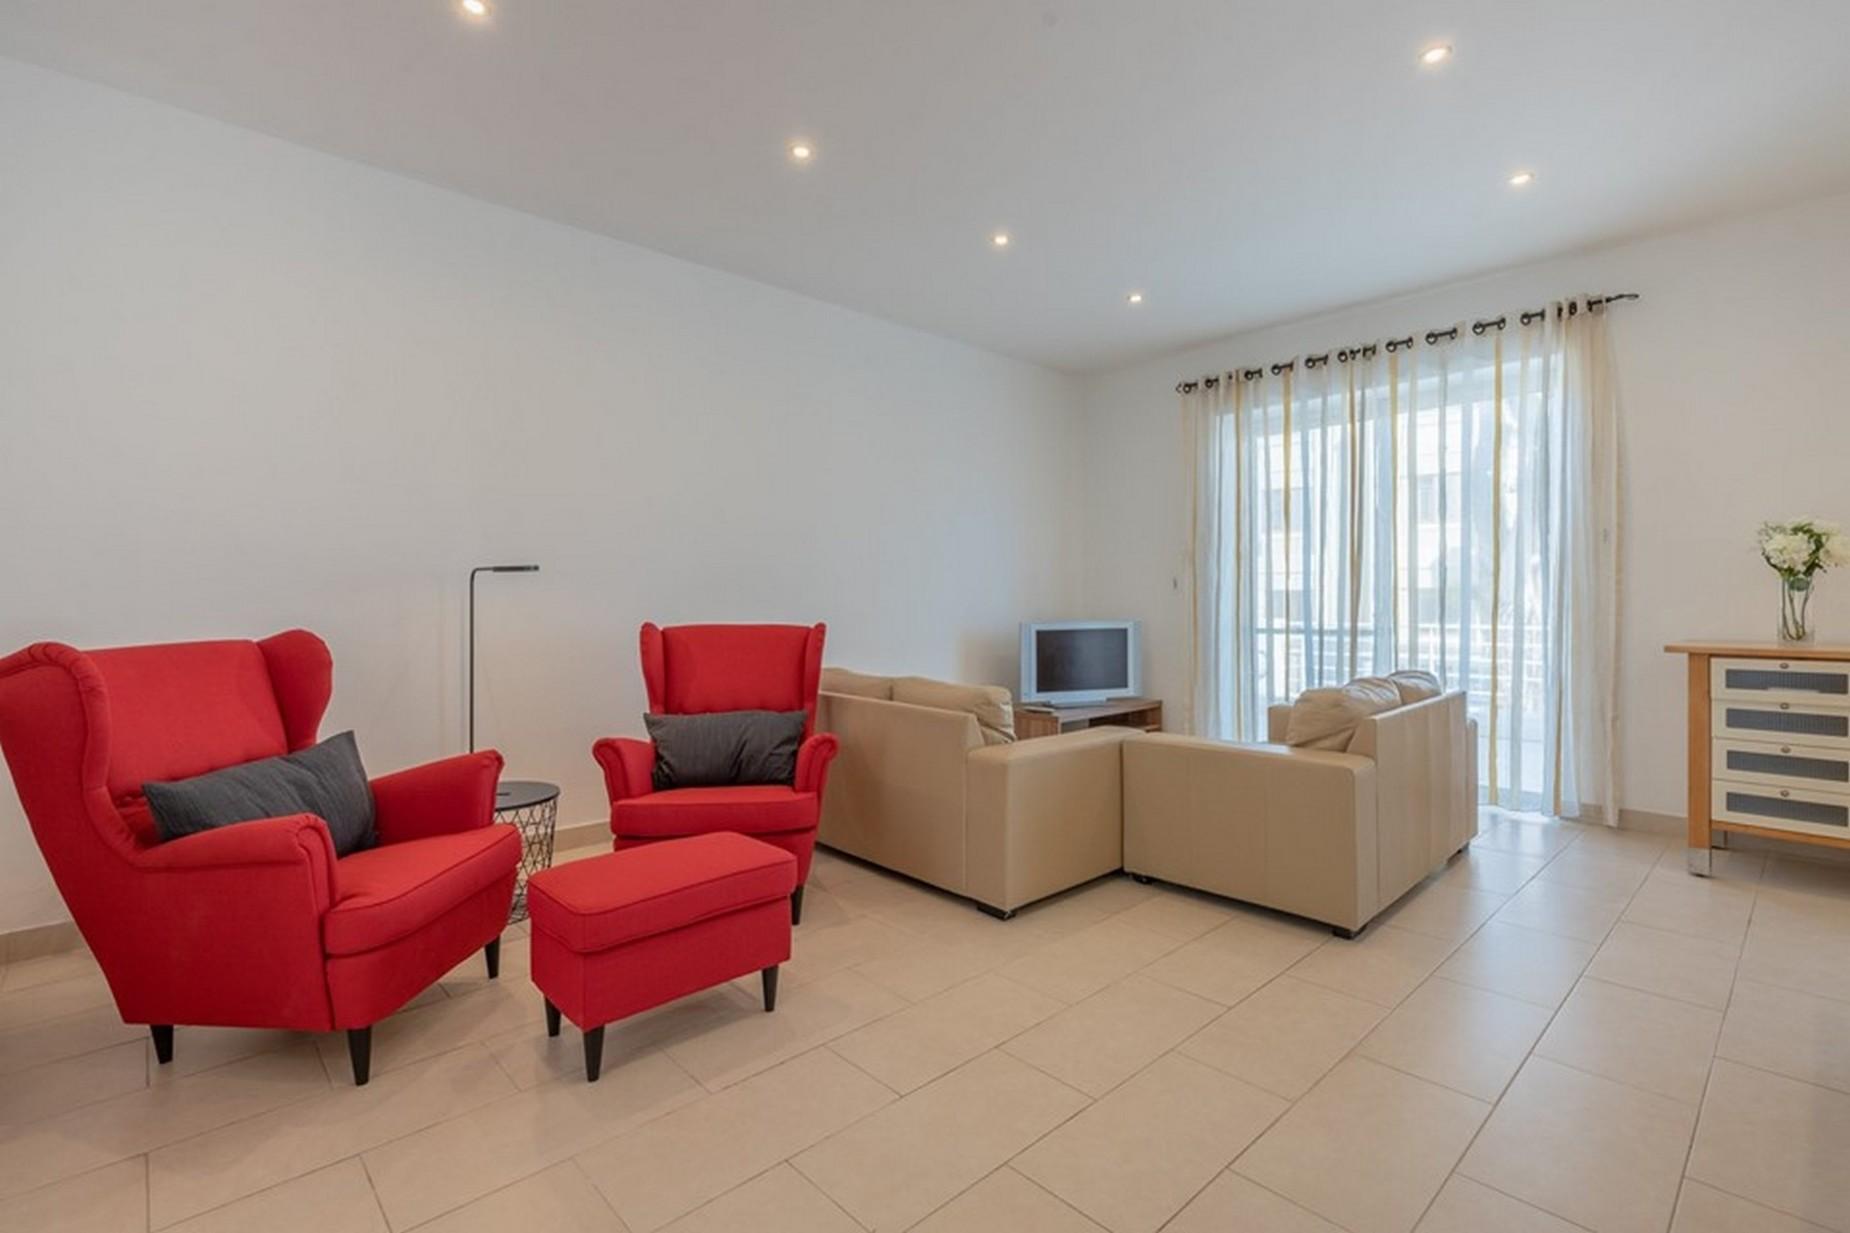 3 bed Maisonette For Rent in Ibragg, Ibragg - thumb 20